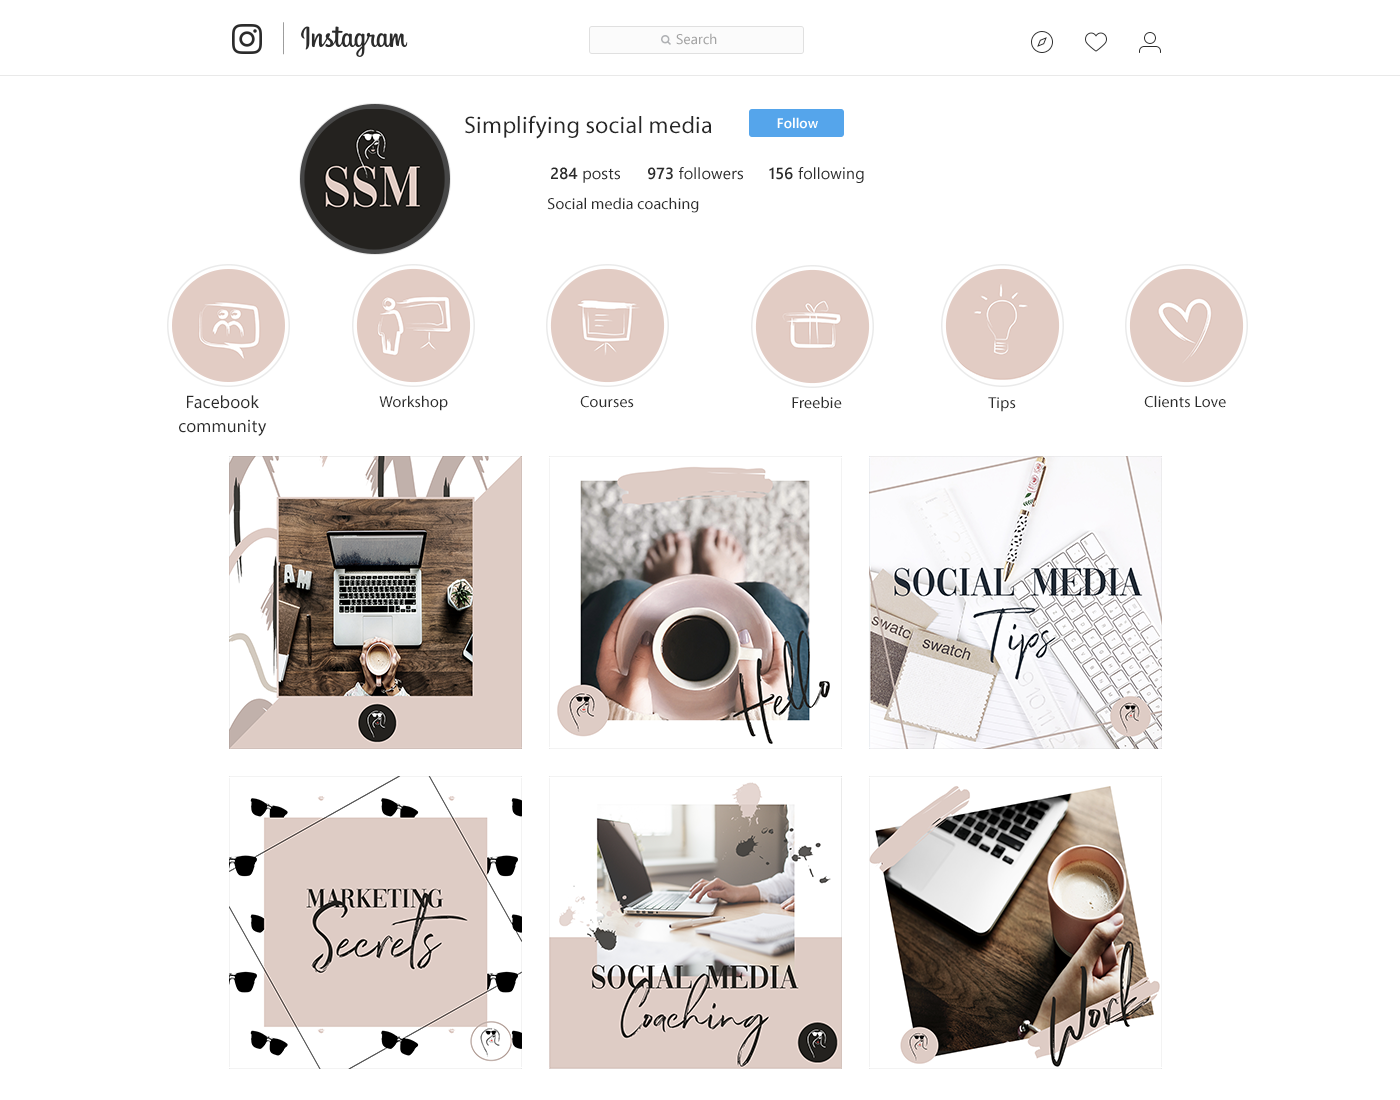 Simplifying social media instagram mockup.png